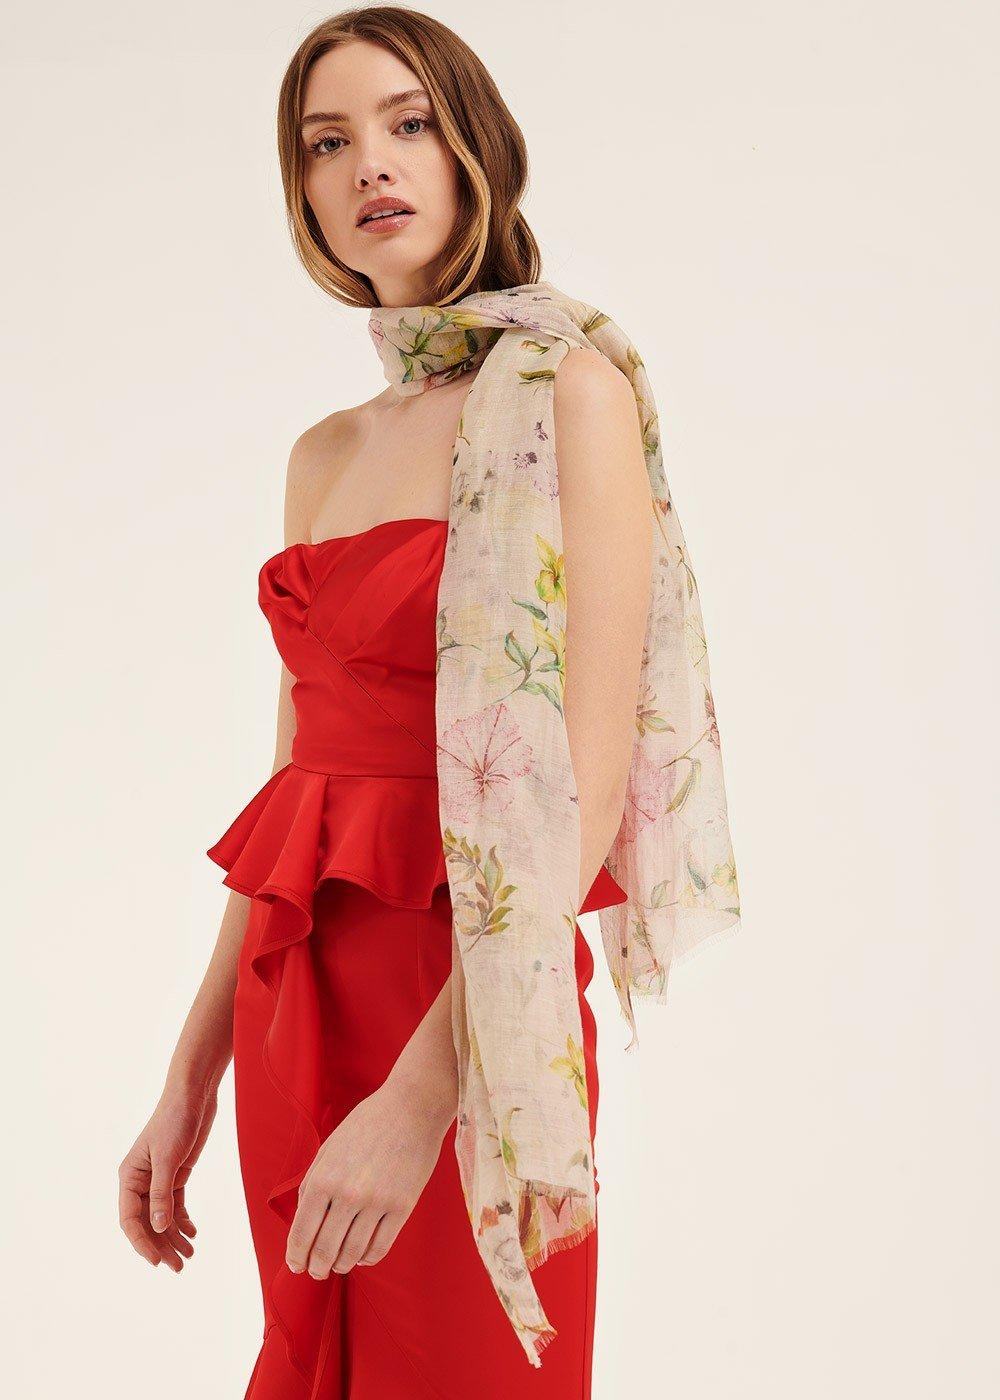 Sciarpa Sidney fantasia floreale - Nudo - Donna